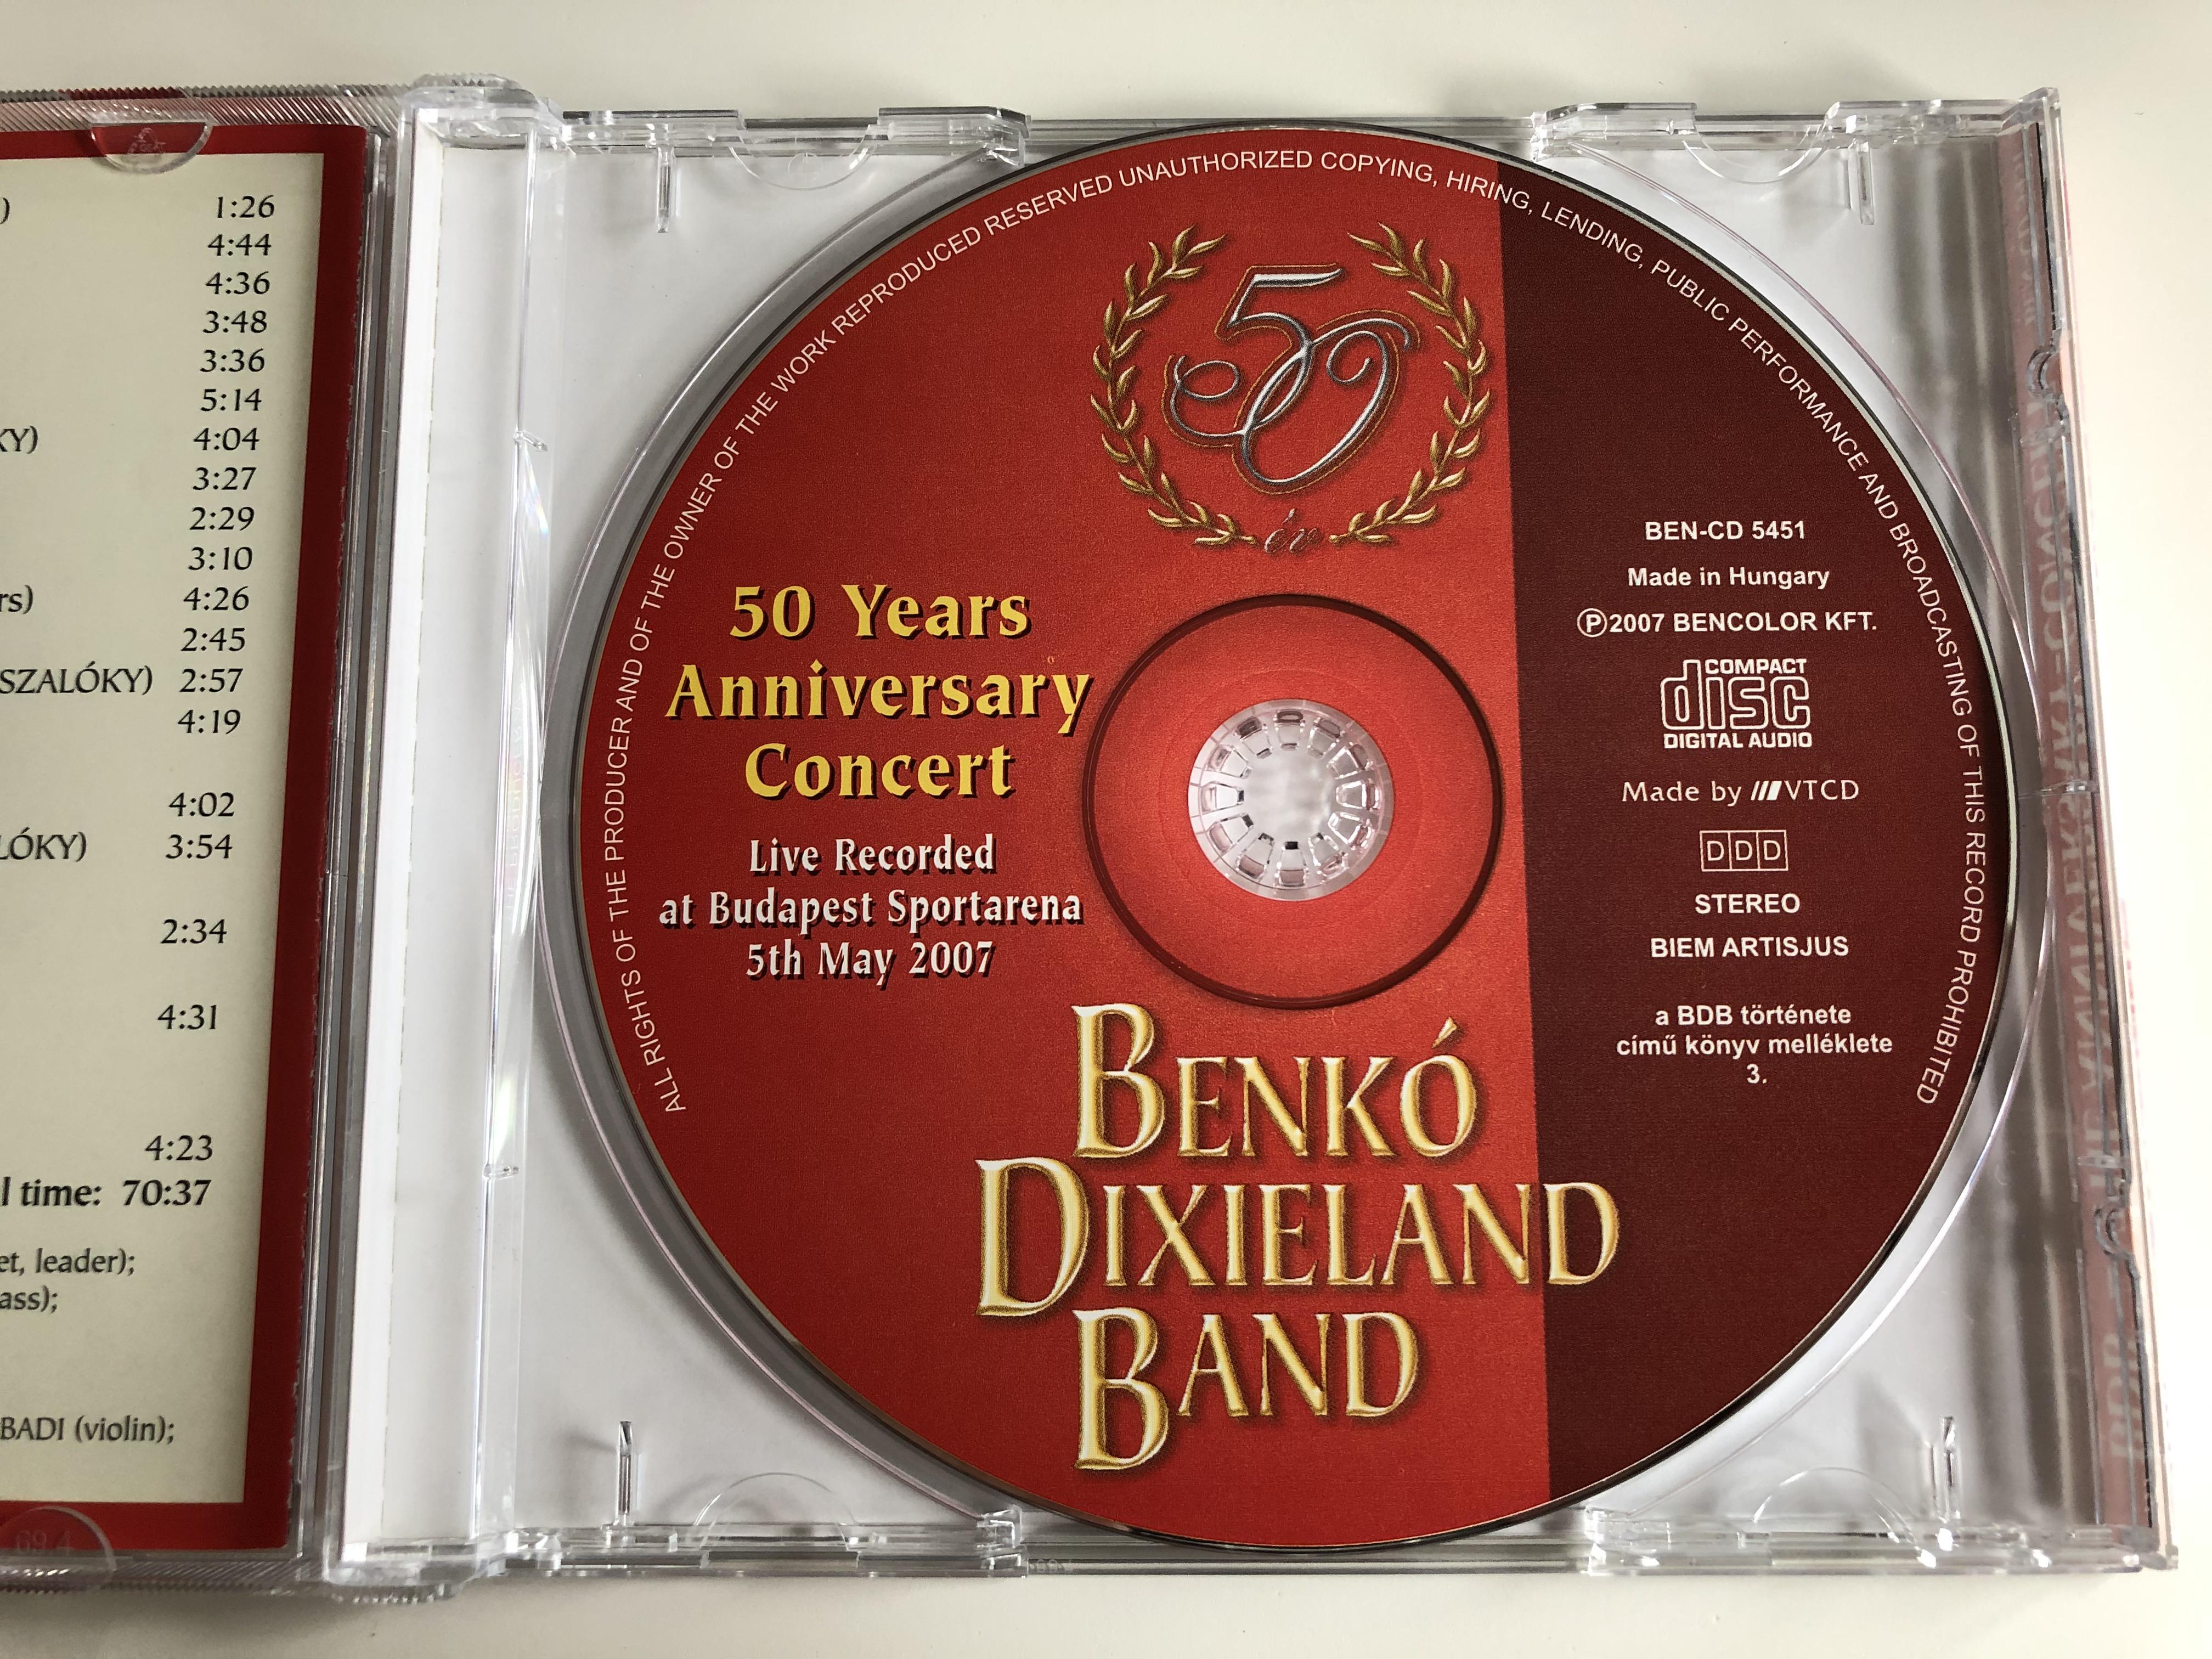 benk-dixieland-band-live-recorded-at-budapest-sportatrena-5nd-may-2007-the-anisversary-concert-bencolor-kft.-audio-cd-2007-stereo-ben-cd-5451-5-.jpg